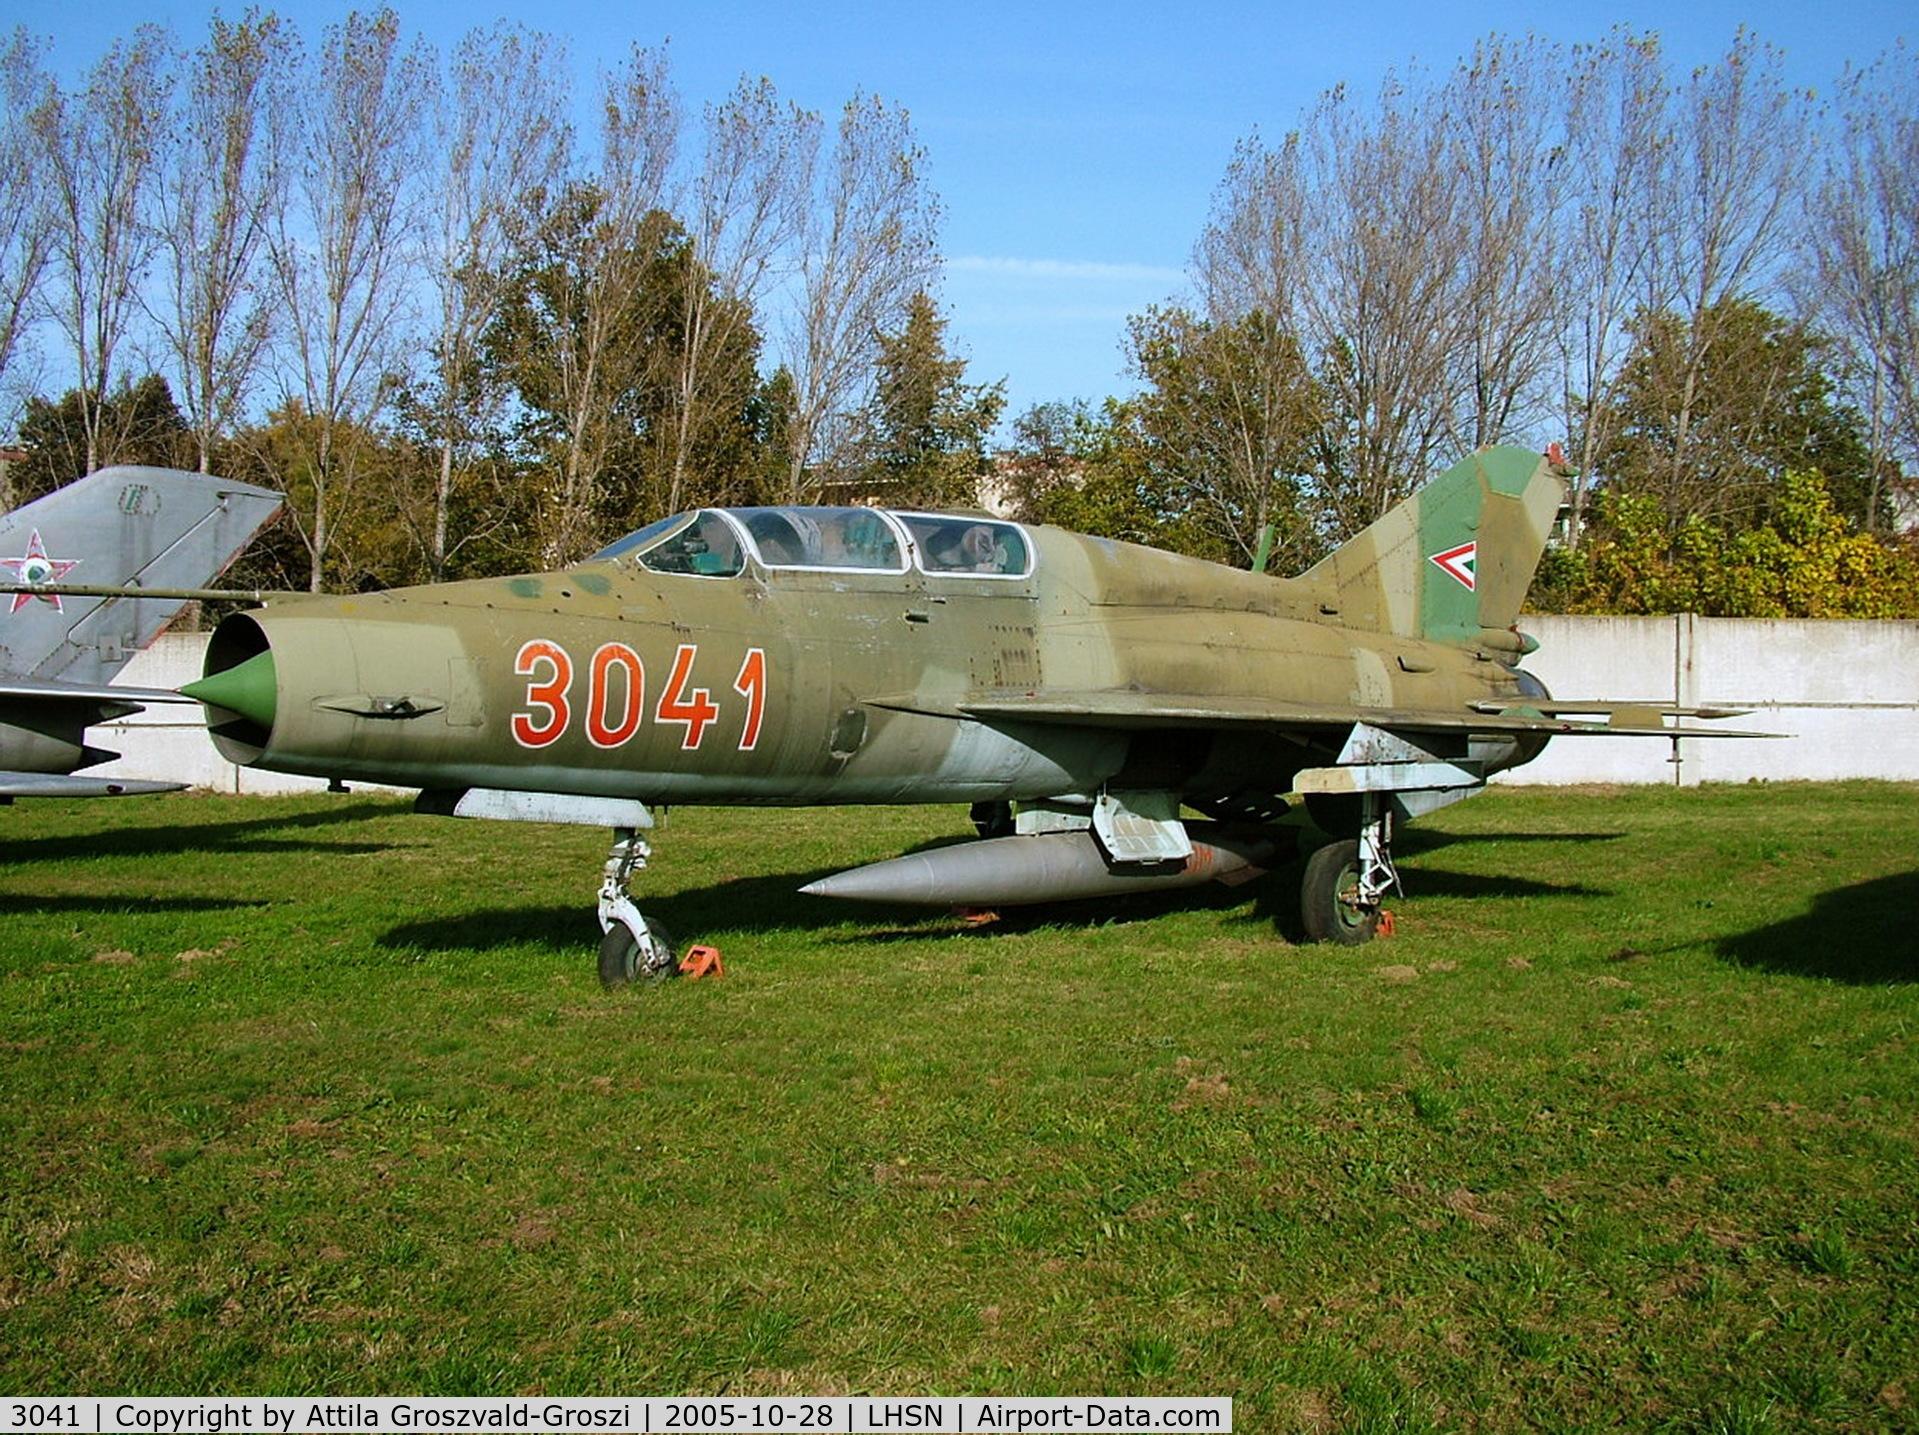 3041, 1974 Mikoyan-Gurevich MIG-21UM C/N 516903041, Szolnok airplane museum, Hungary